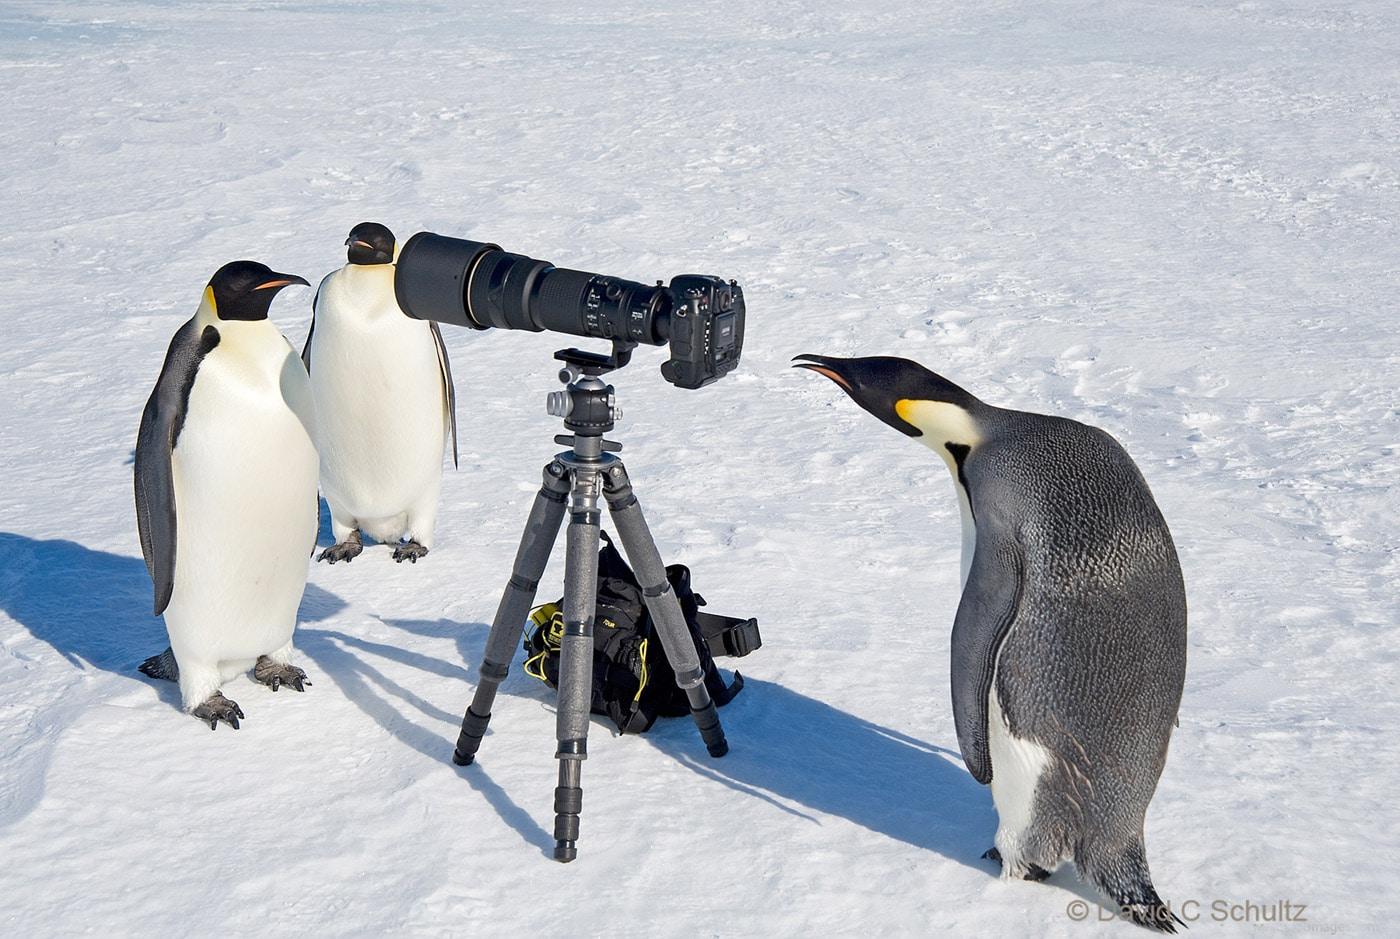 Emperor Penguins Penguin Paparrazi - Image #163-4323